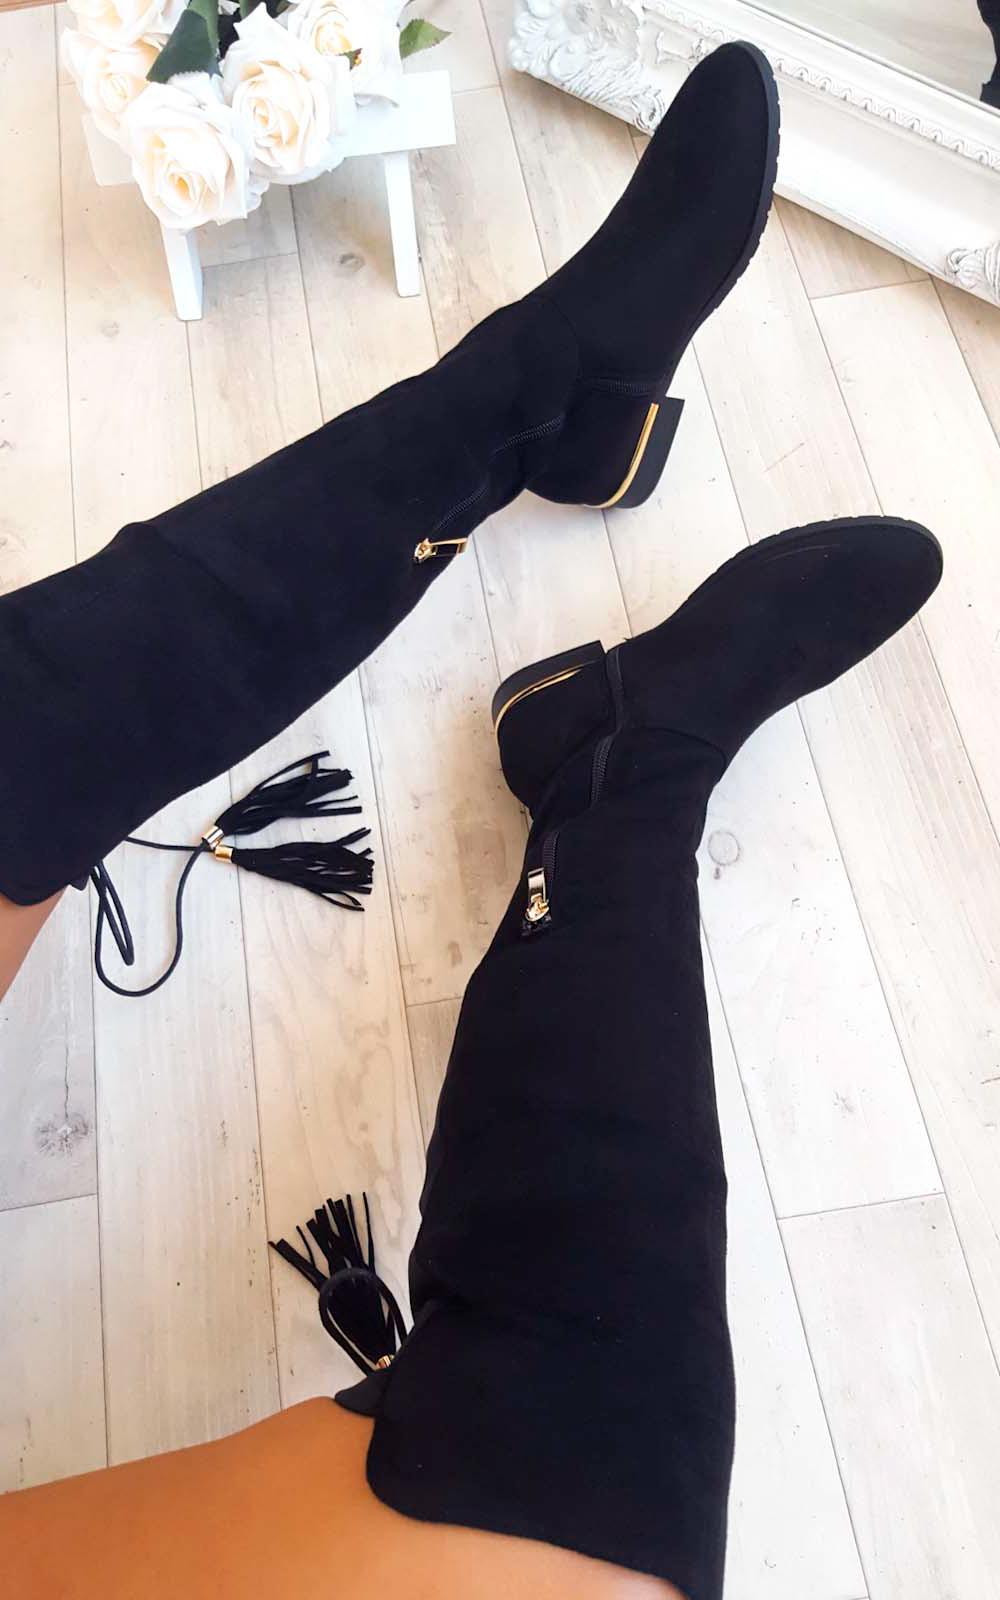 Raven Faux Suede Tie Tassel Knee High Boots in Black